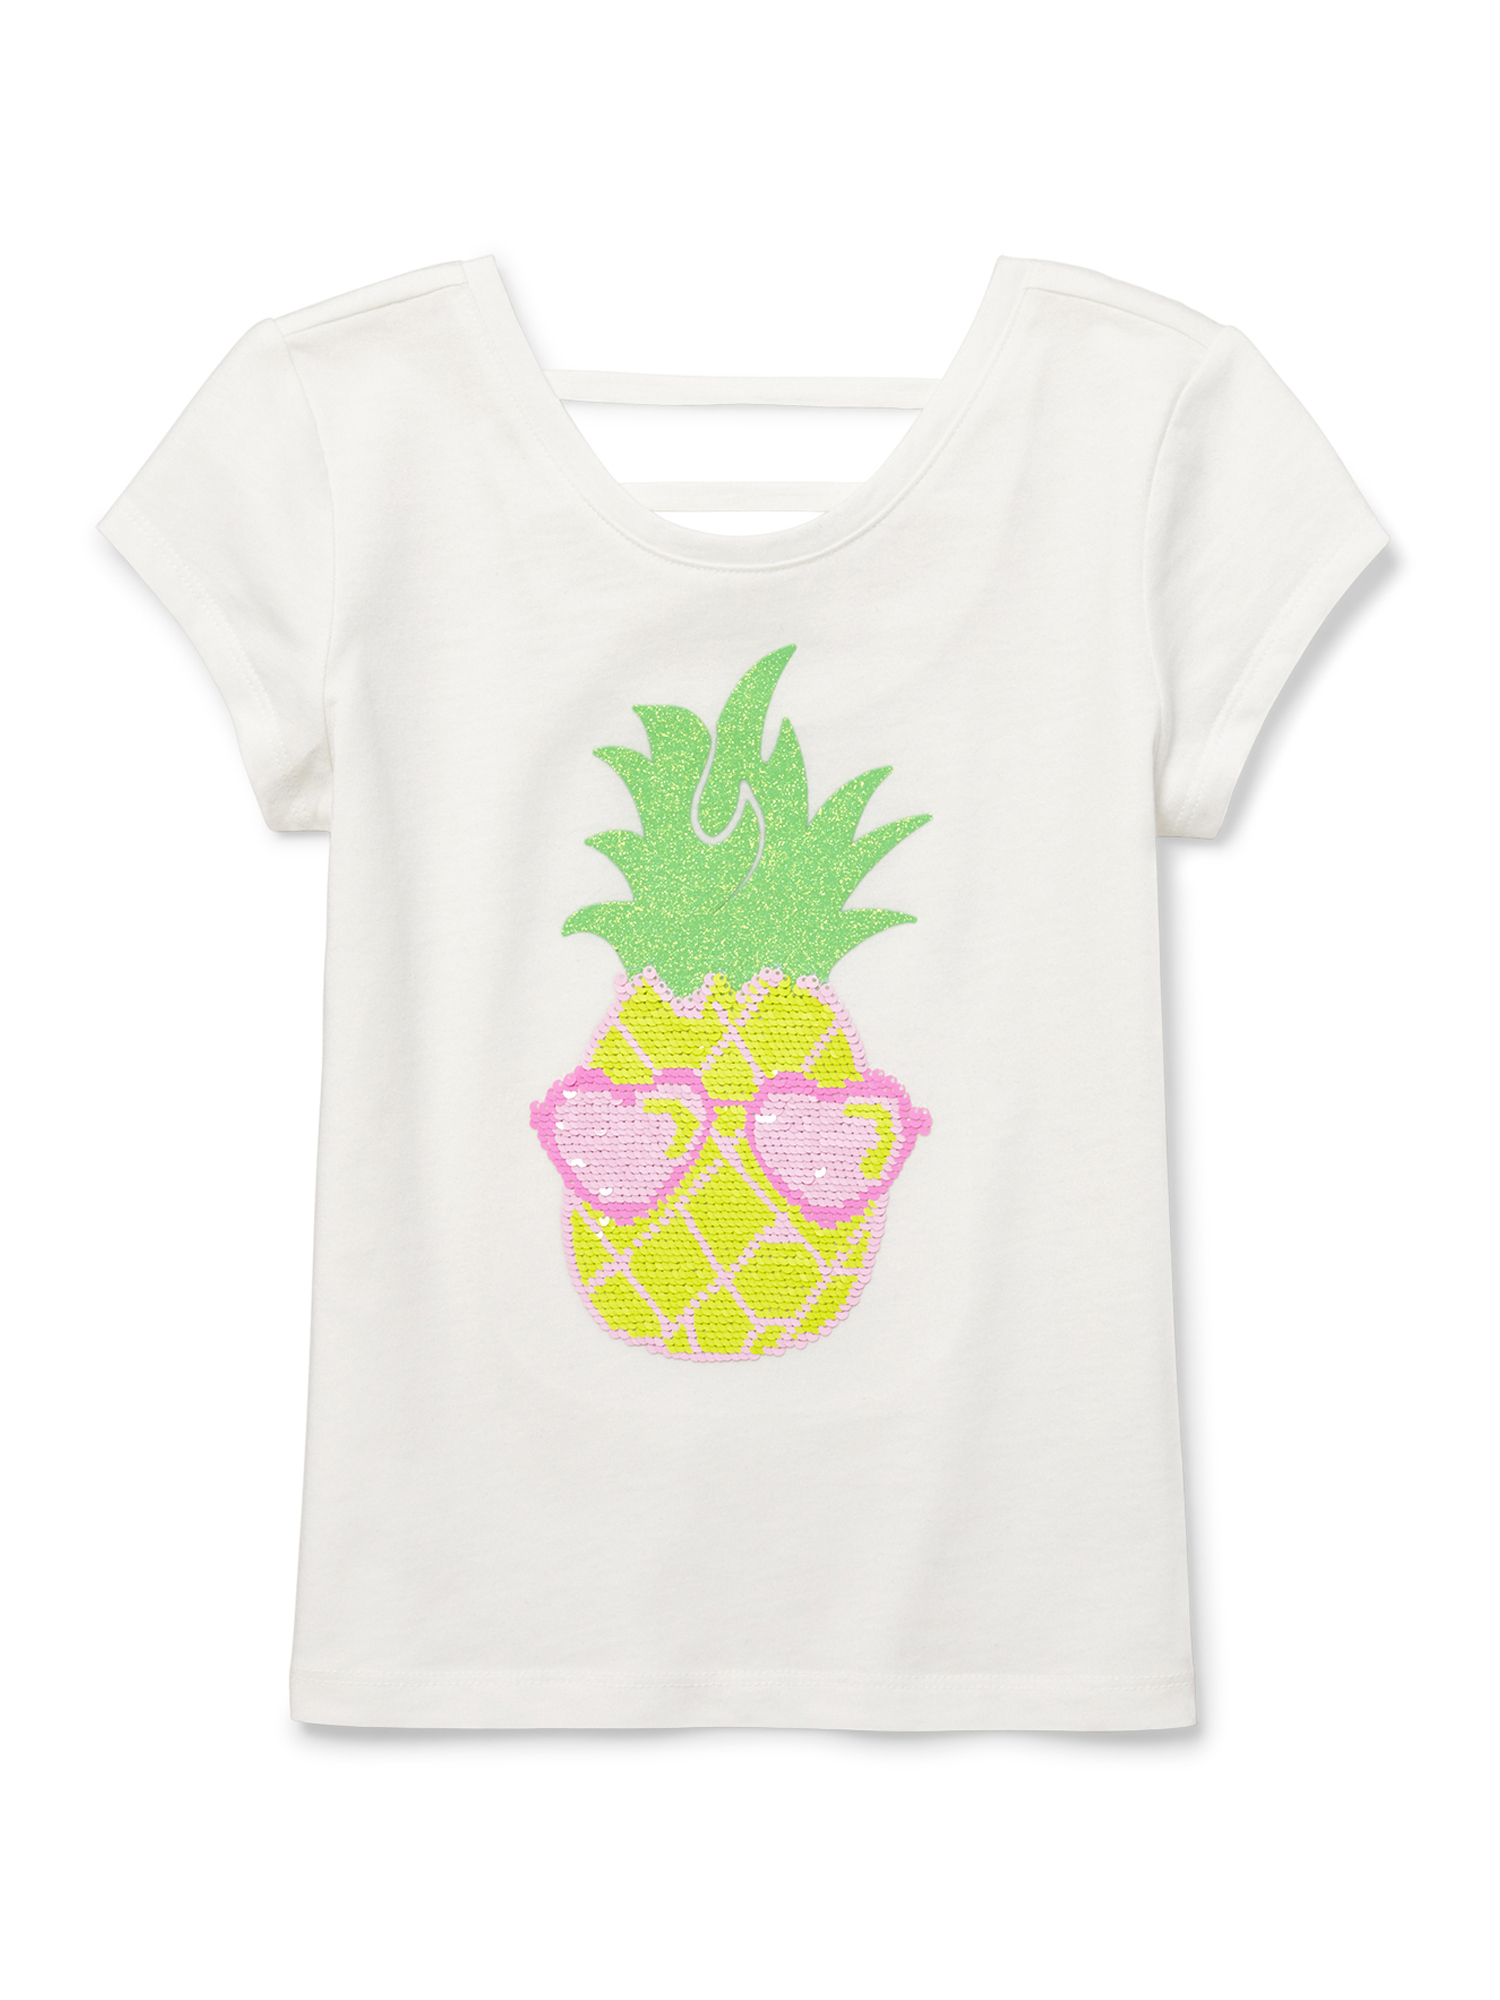 Reversible Flip Sequin Pineapple Lace Up Tee (Little Girls & Big Girls)